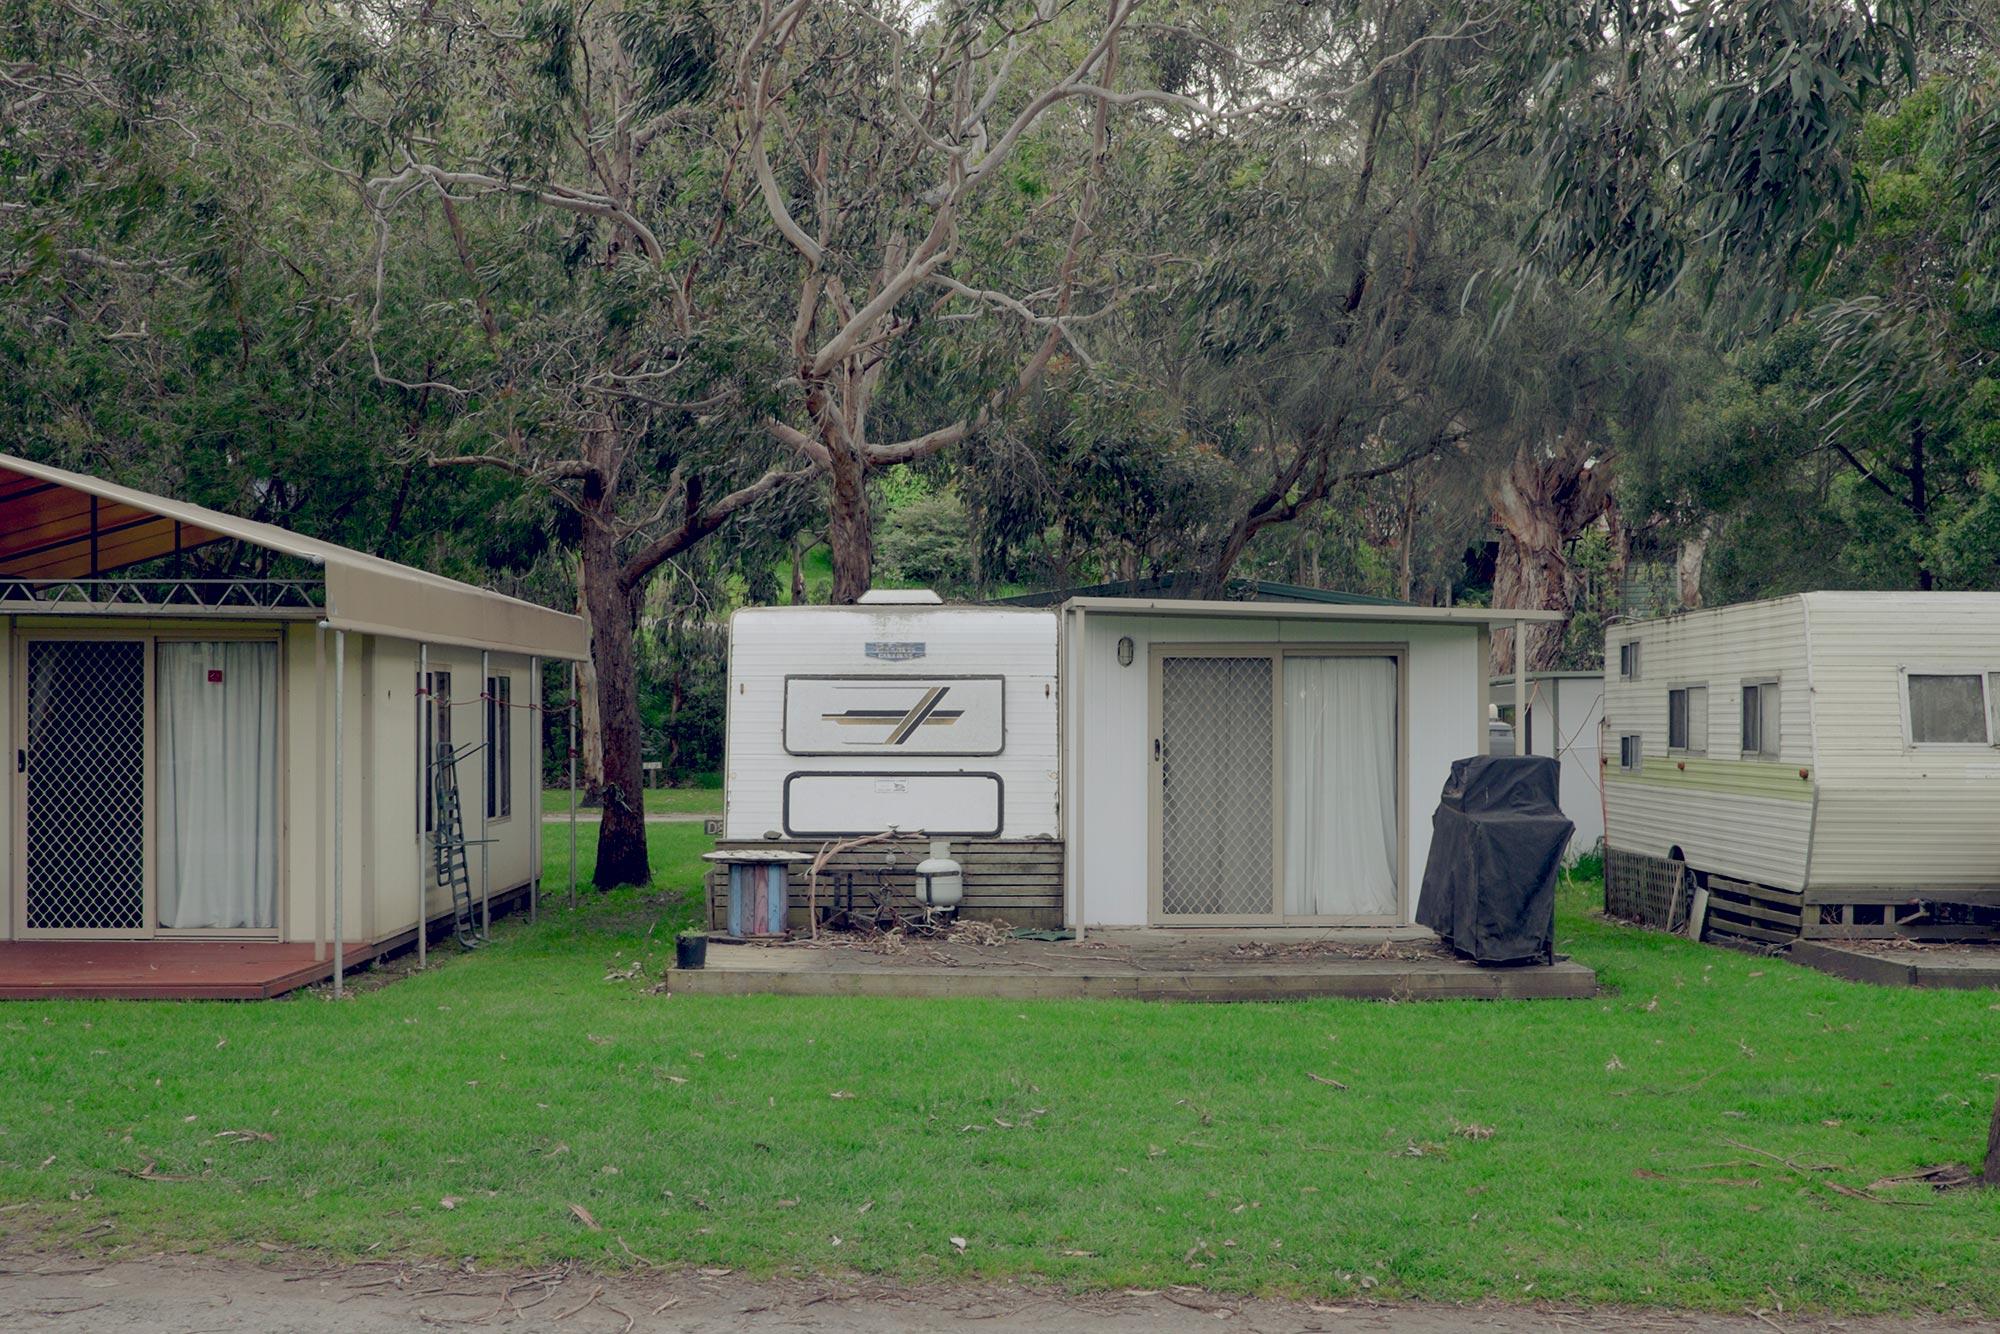 australia-melbourne-great-ocean-road-kennet-river-holiday-park-koala6